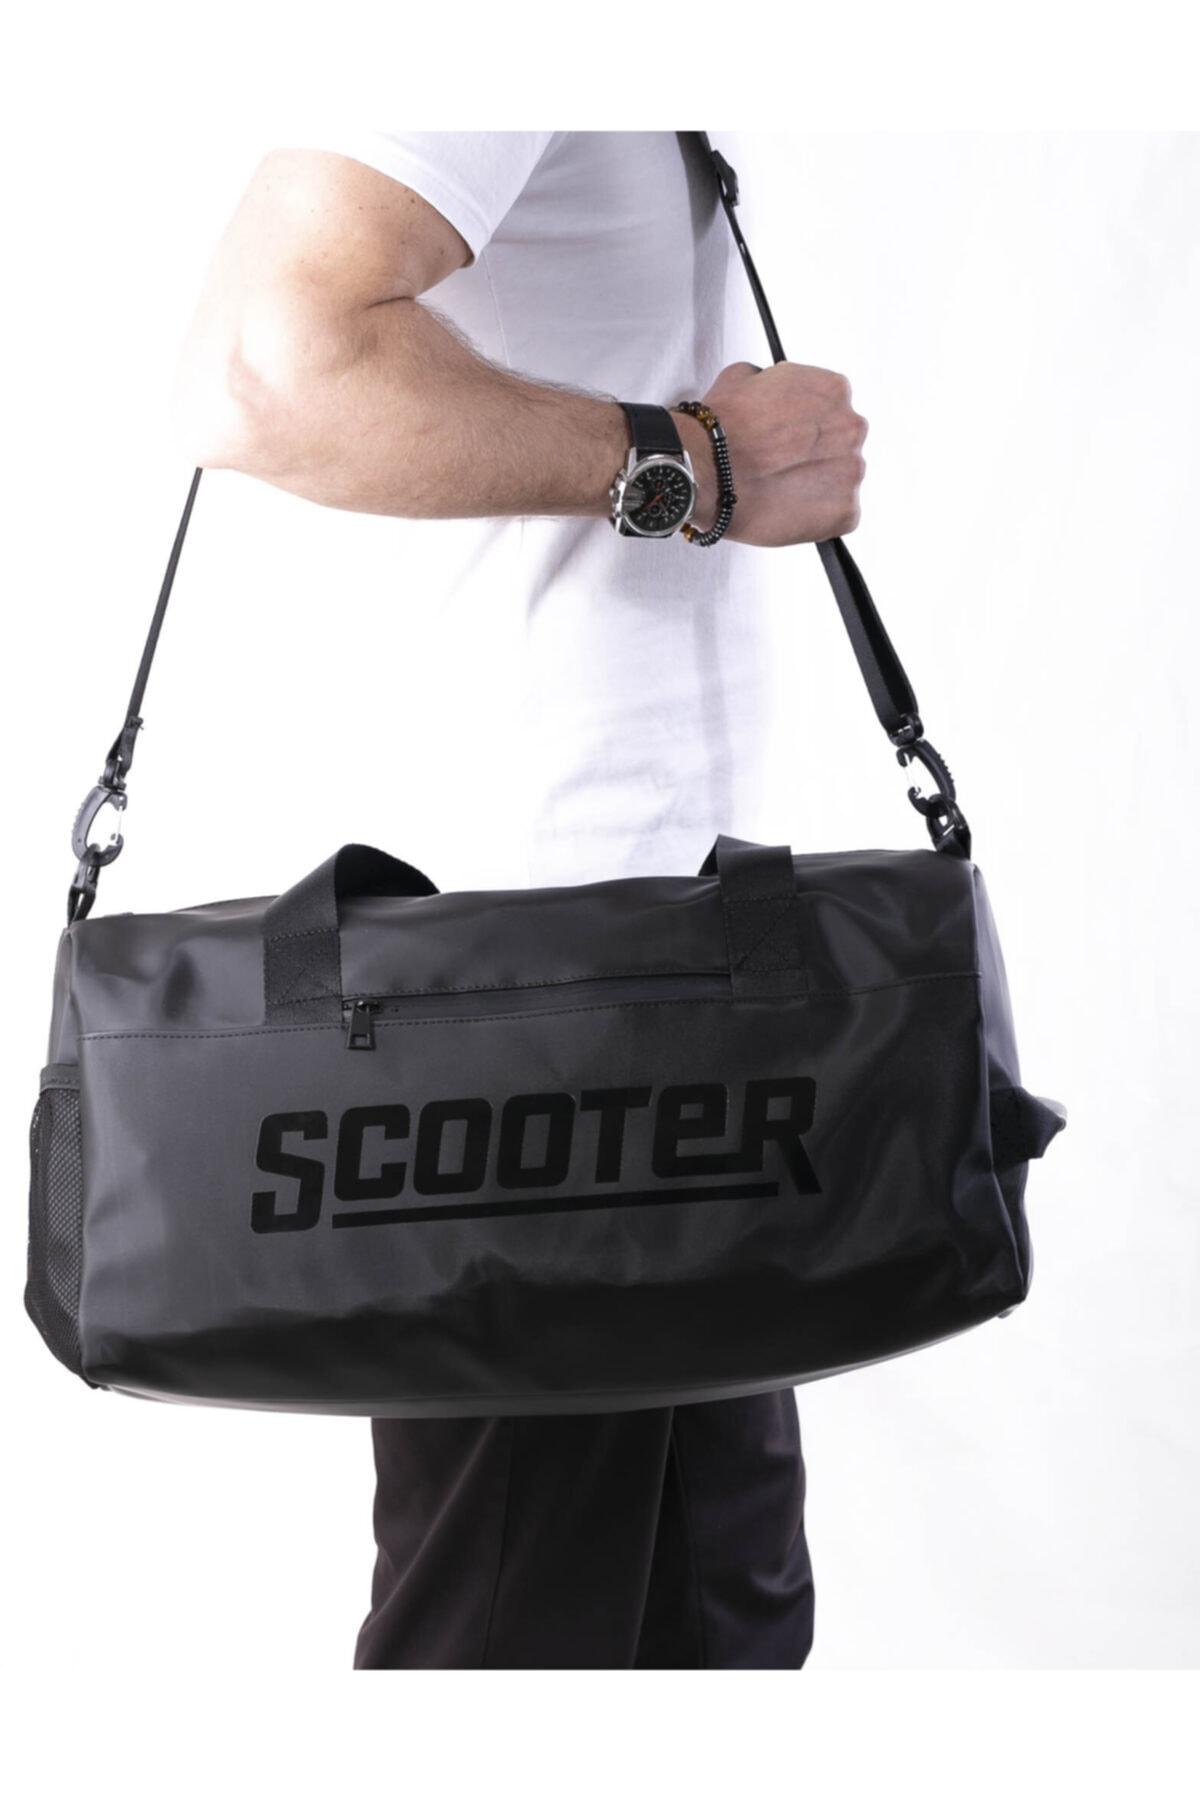 Scooter Spor Çanta 1